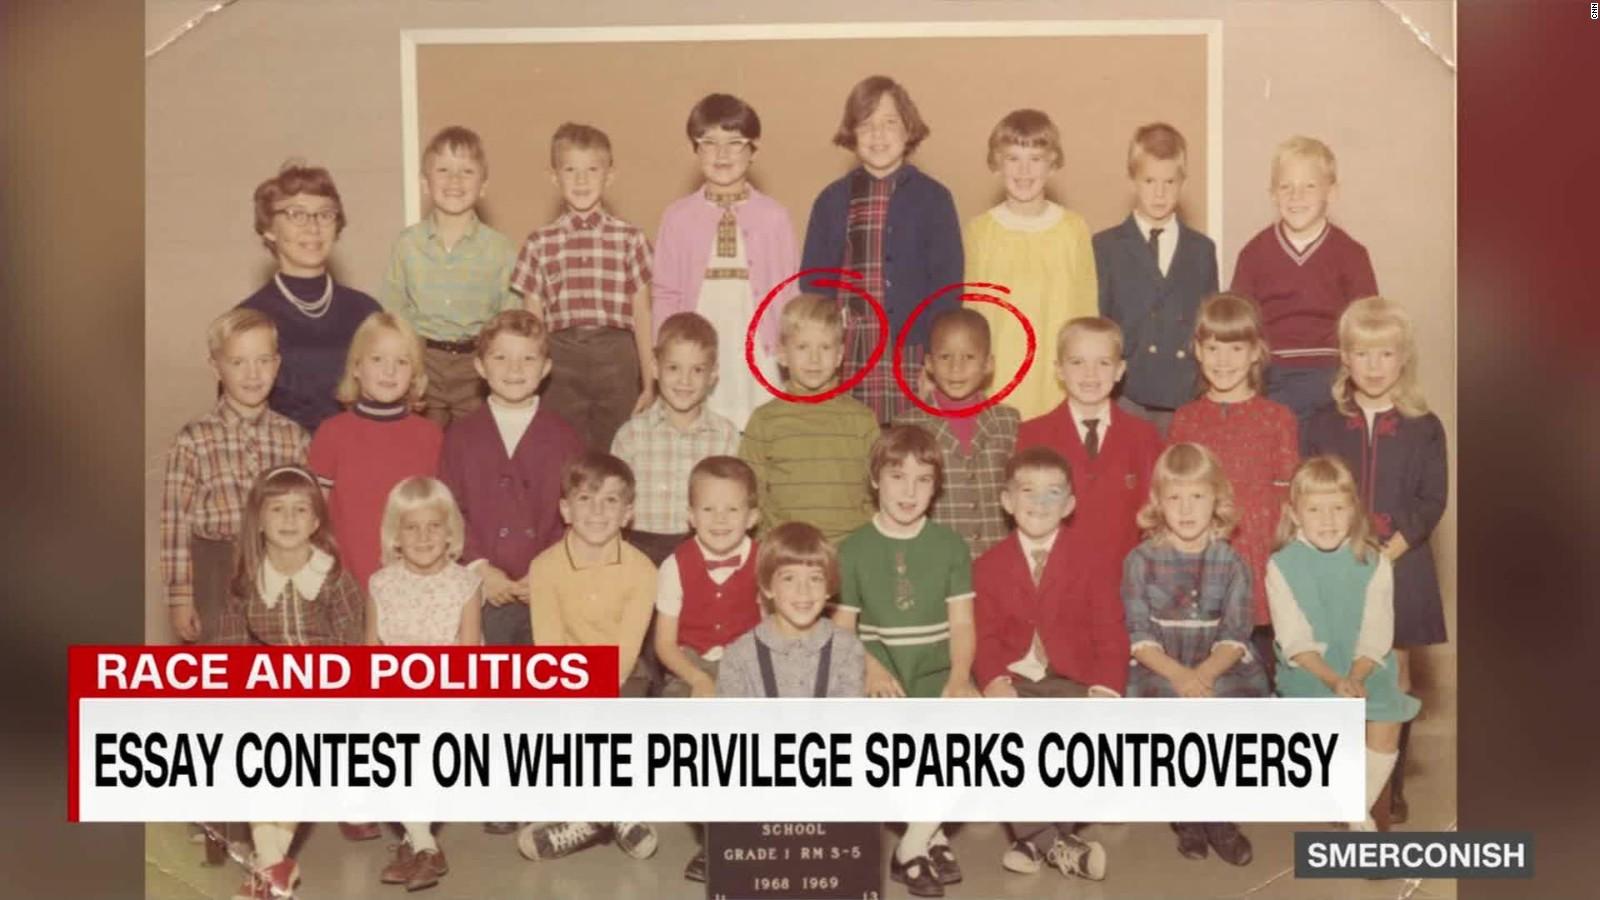 white privilege essay contest gets smerconish thinking cnn com